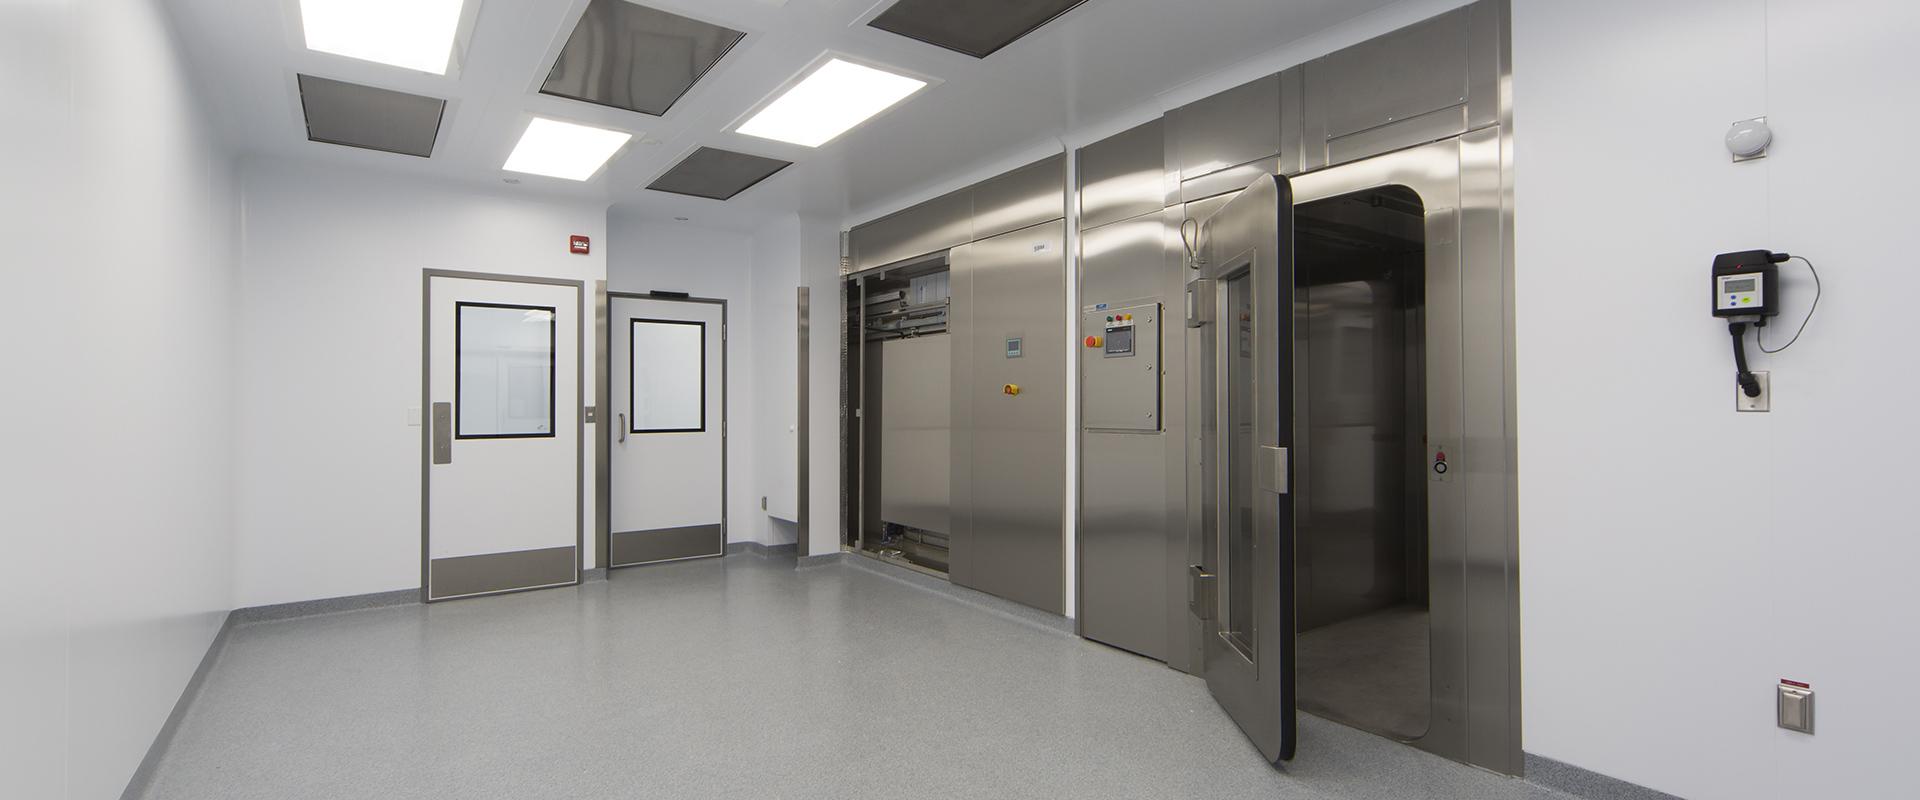 Laboratoire Omega par Groupe Geyser